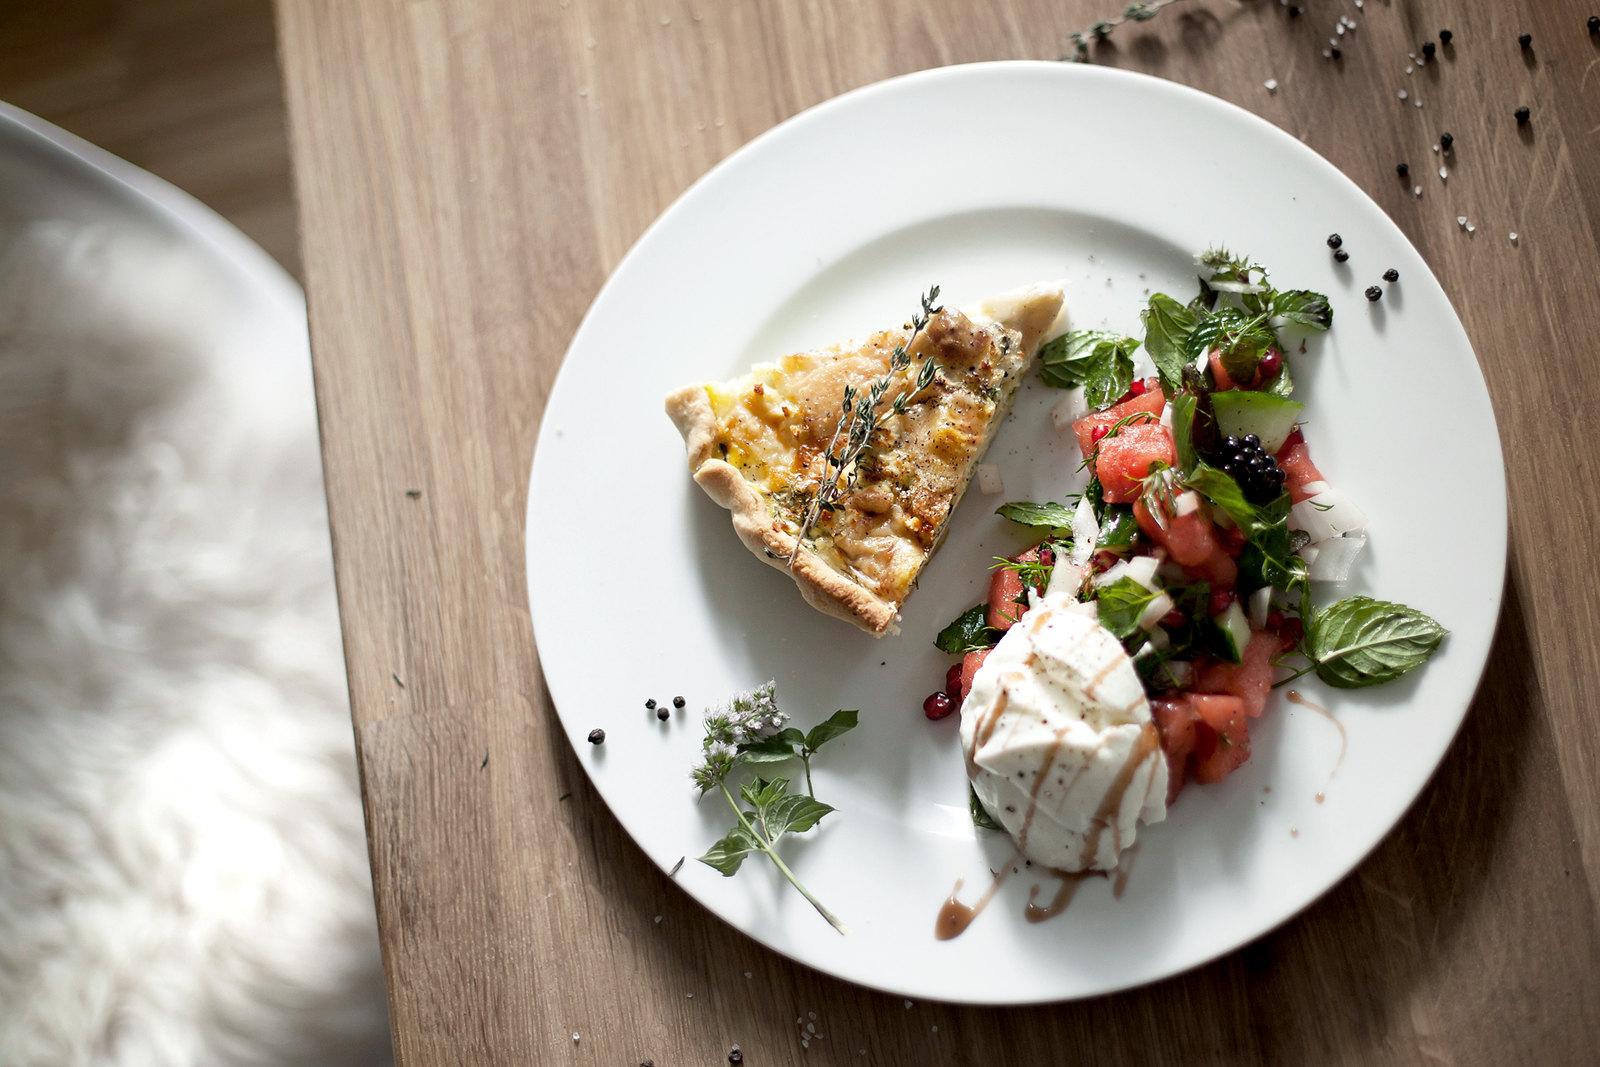 rezept kochen quiche salad cooking recipe morocco healthy fruit magazine lifestyle lifestyleblogger blogger germany berlin dusseldorf cats & dogs blog fashionblogger ricarda schernus 1